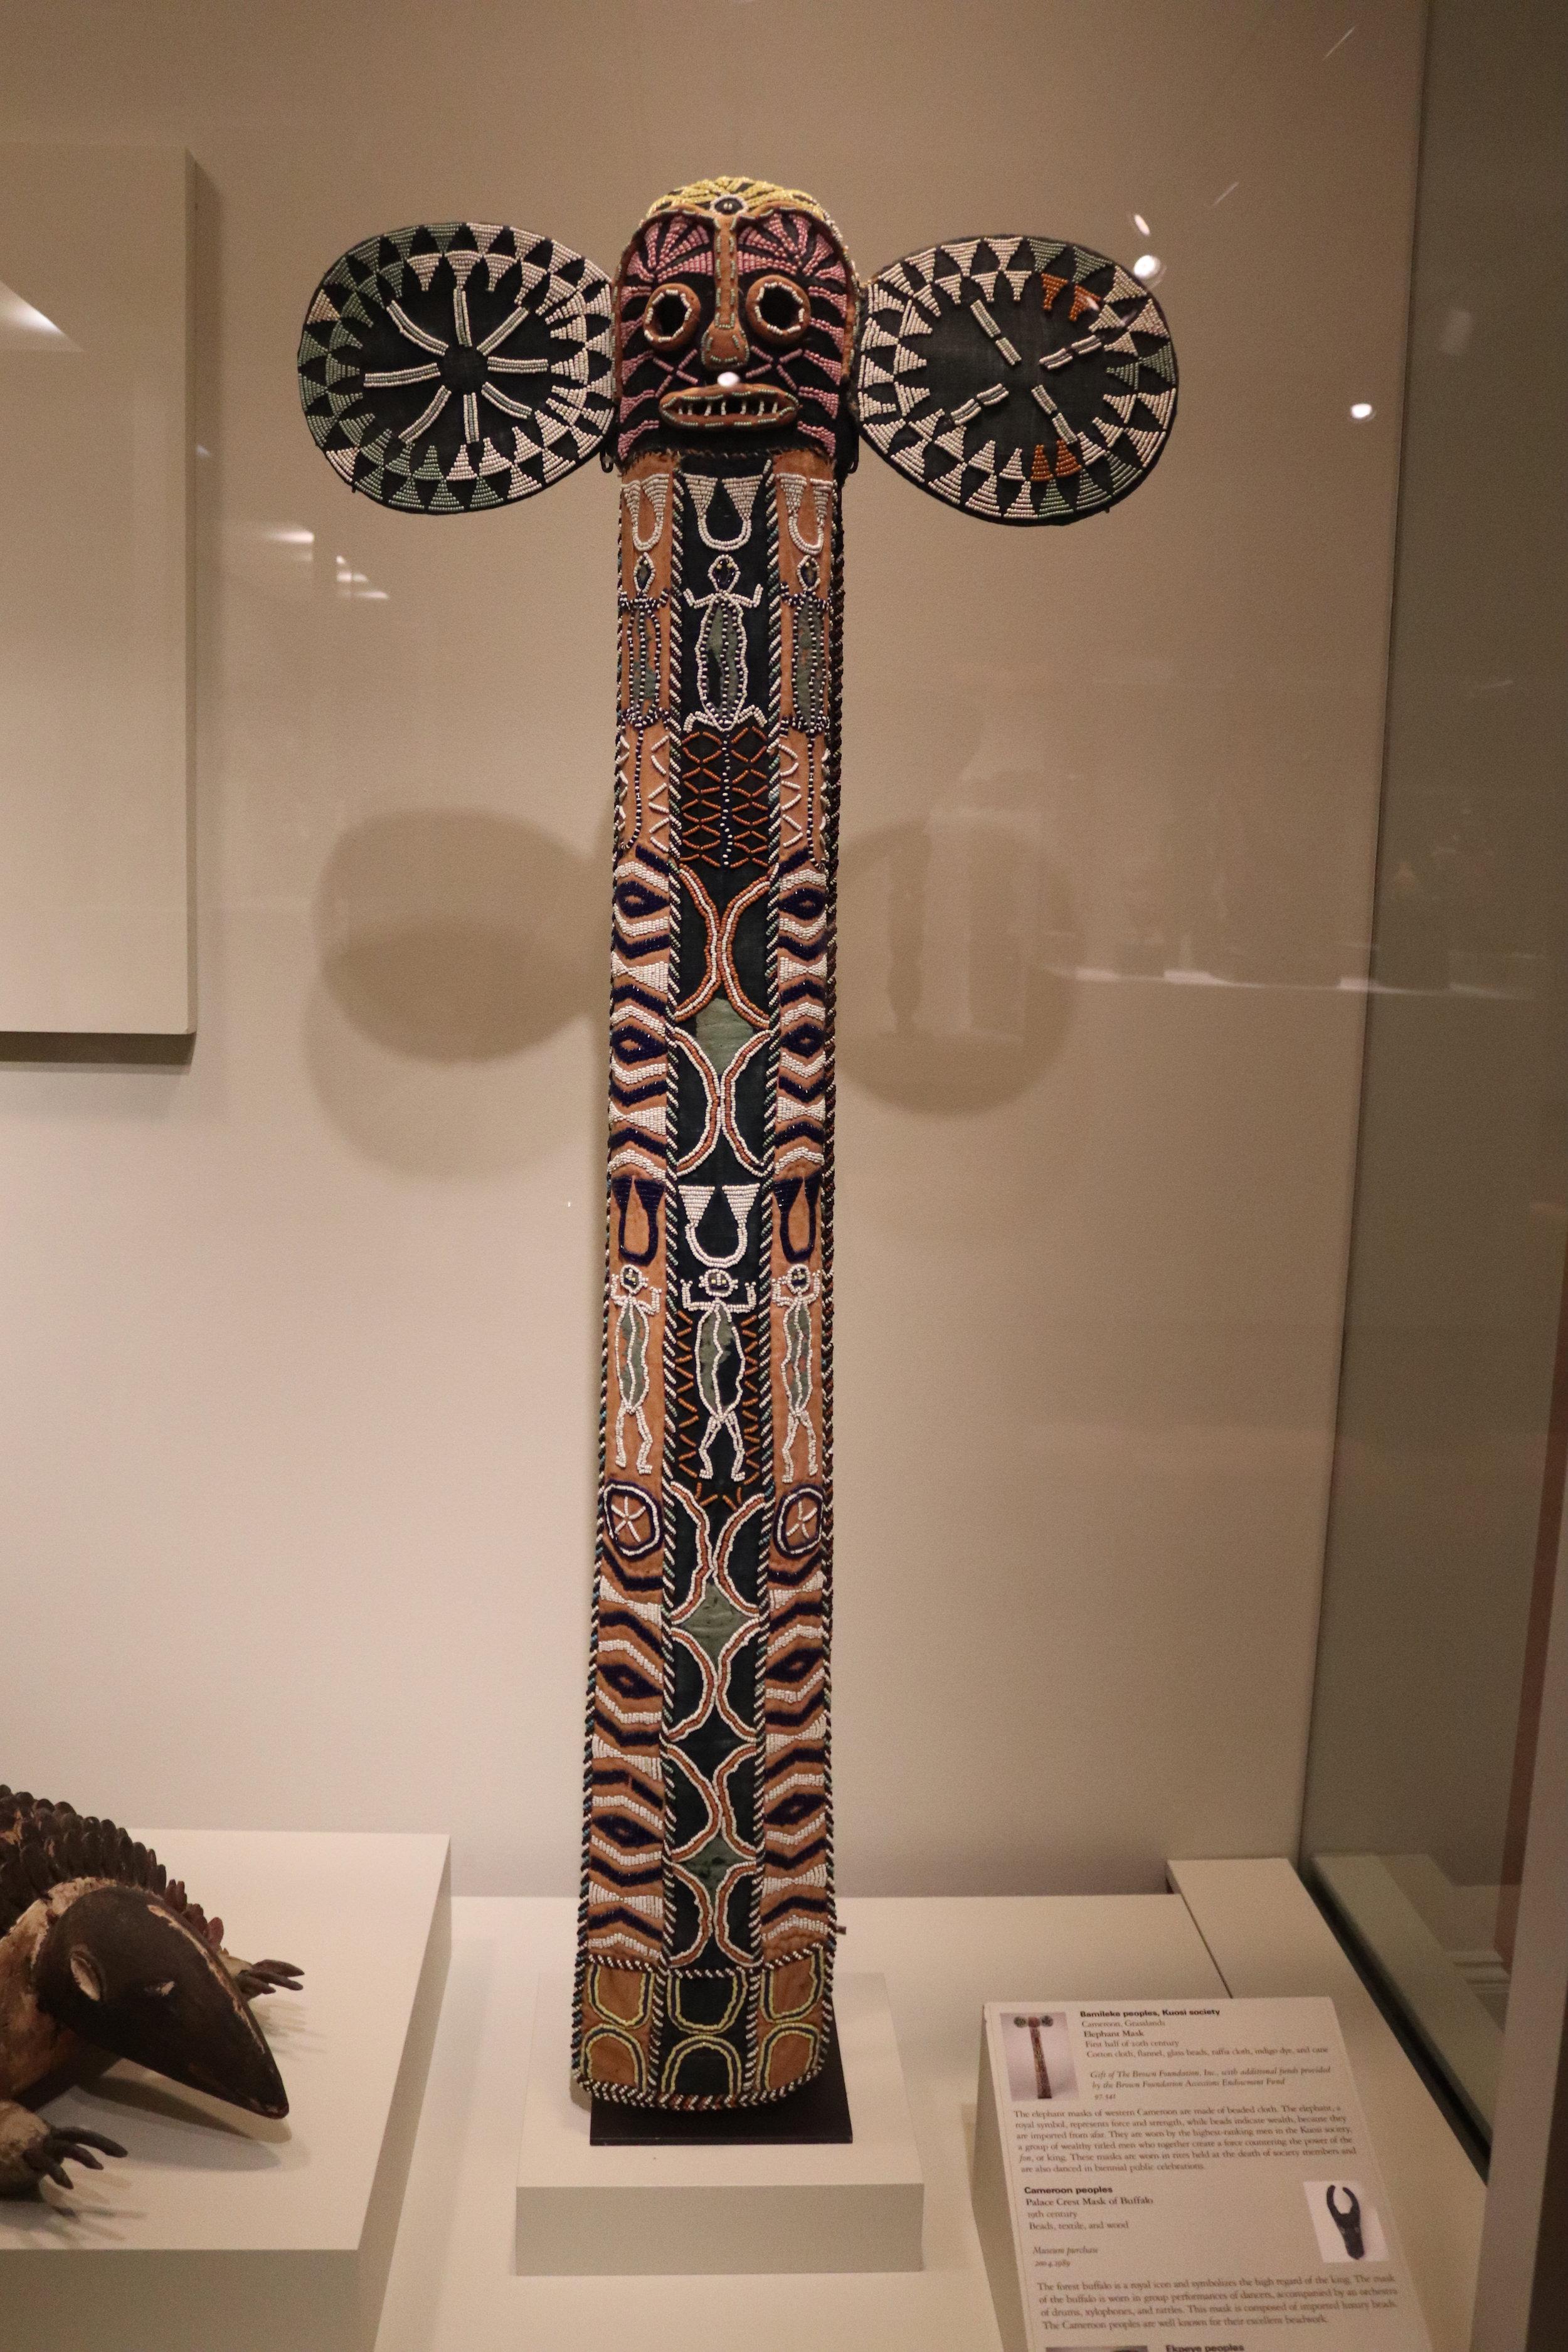 Elephant Mask  -  Bamileke Peoples, Kuosi Society , Cameroon Early 20th Century - Museum of Fine Arts, Houston